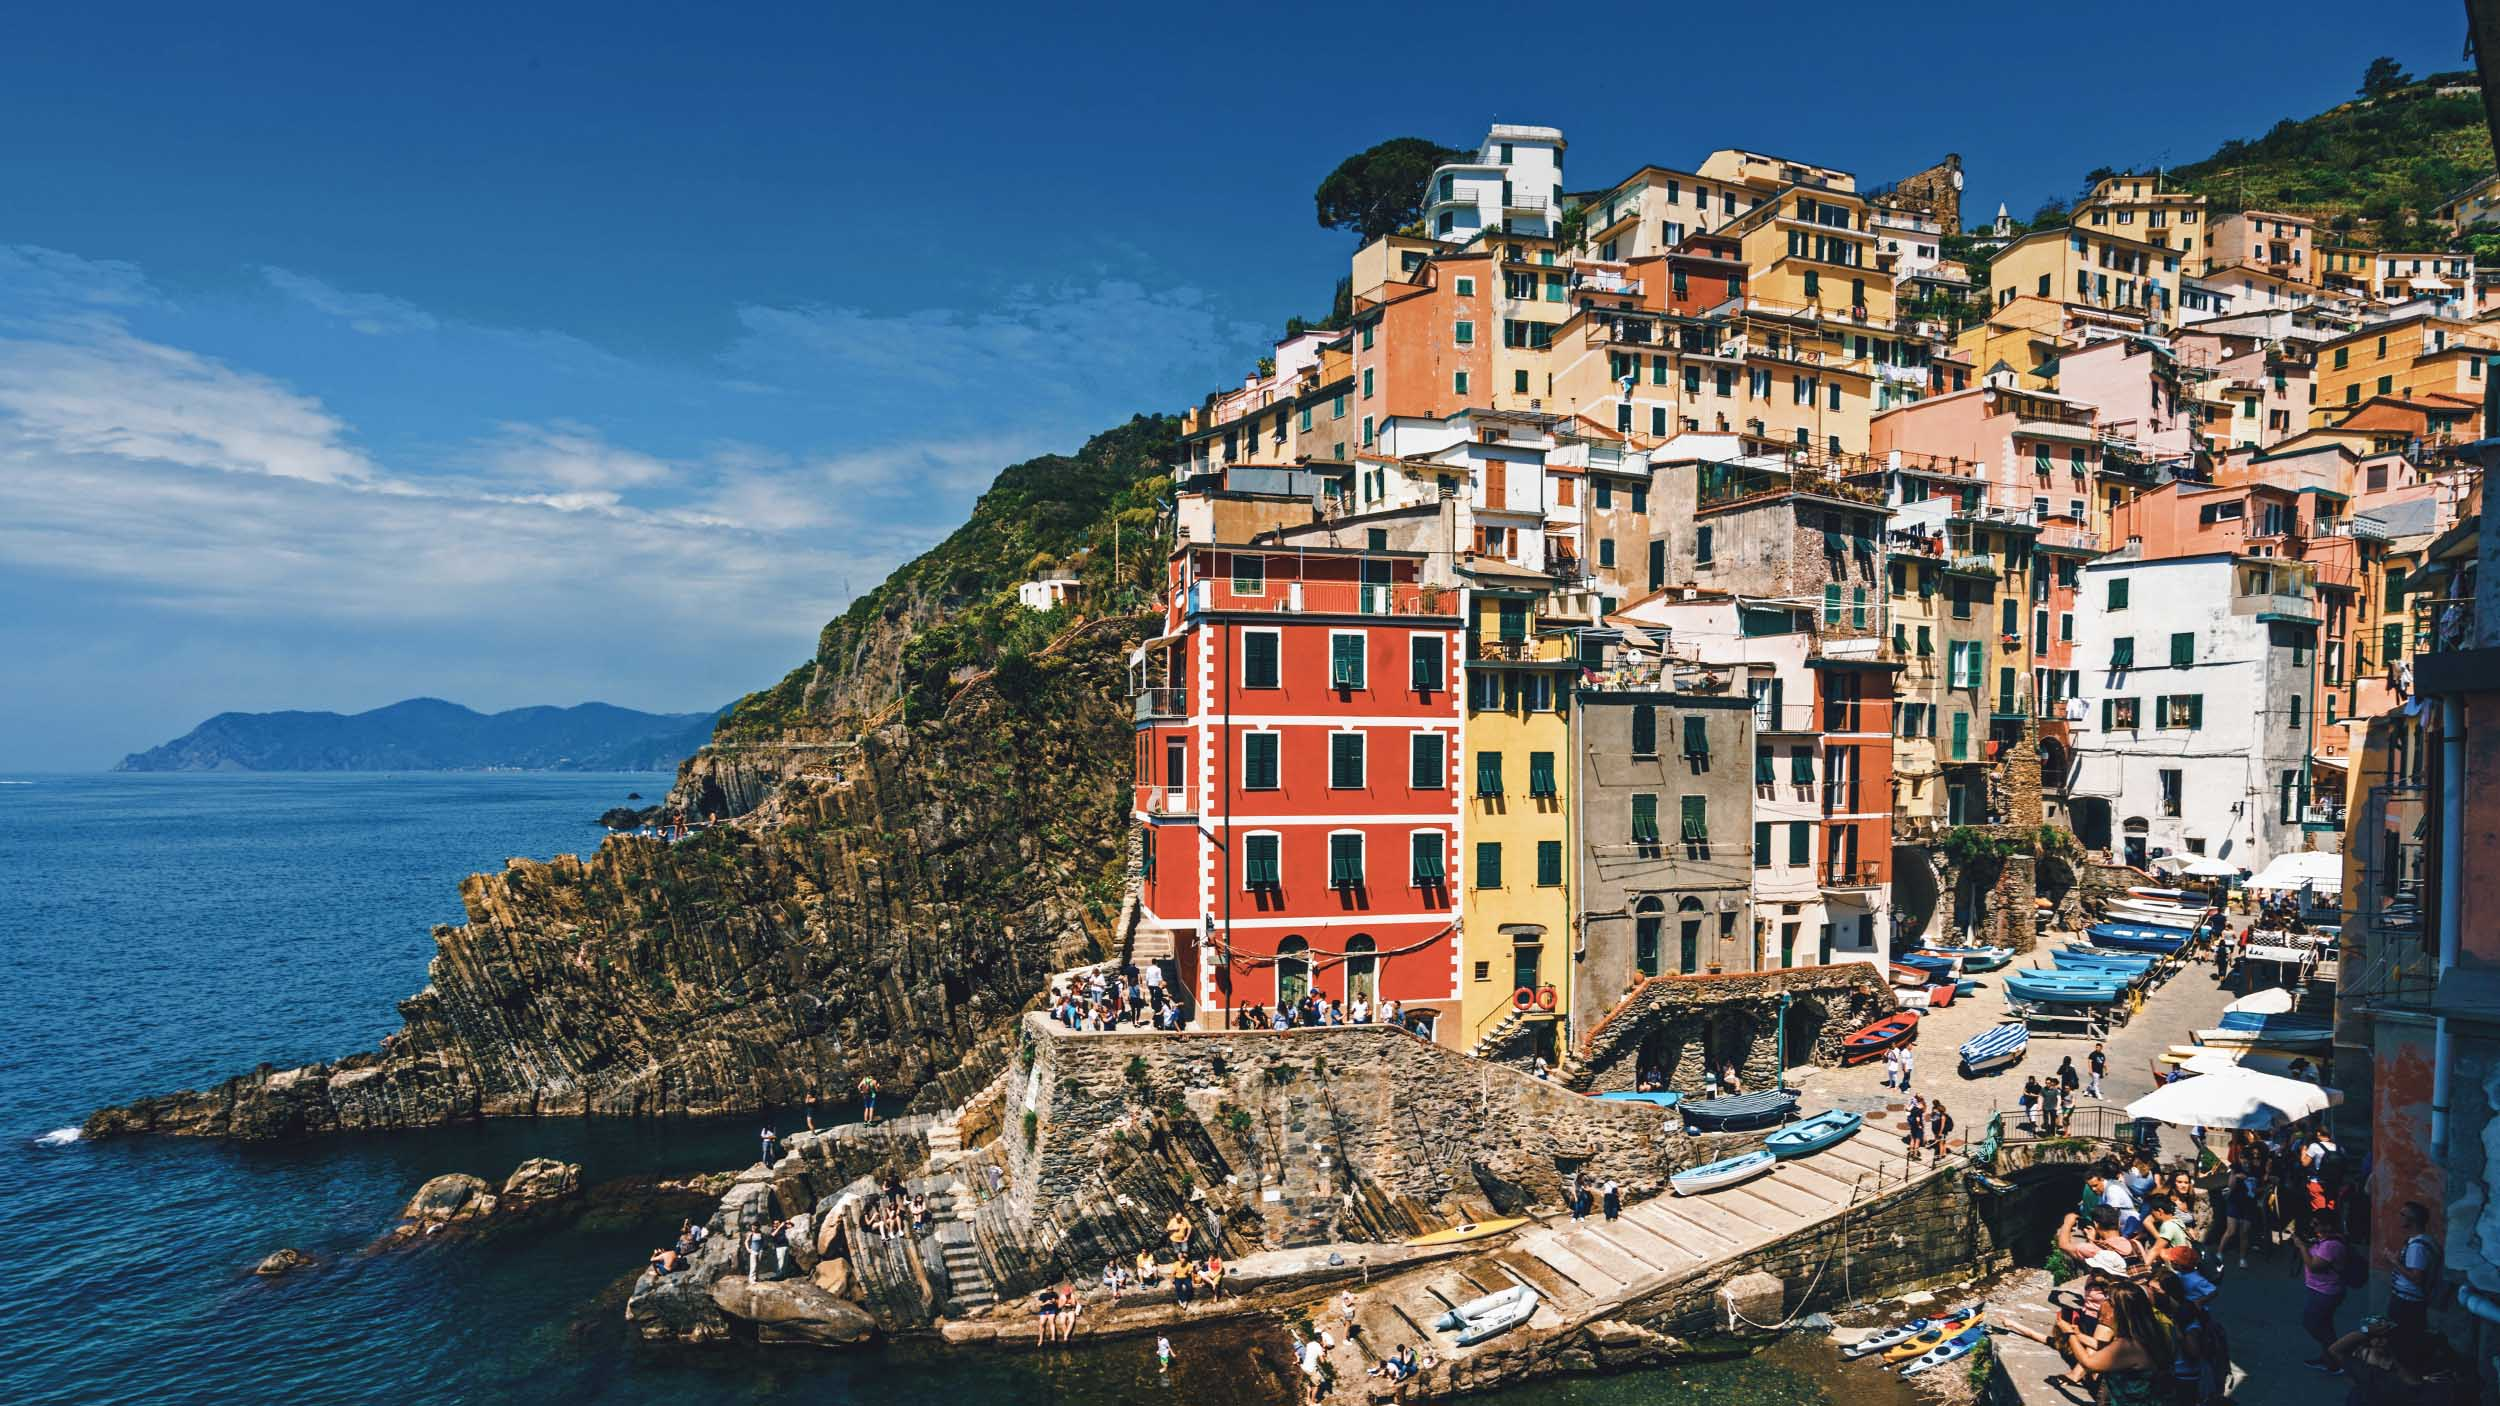 Cinque Terre italienische dörfer zwischen bergen am meer video thumpnail